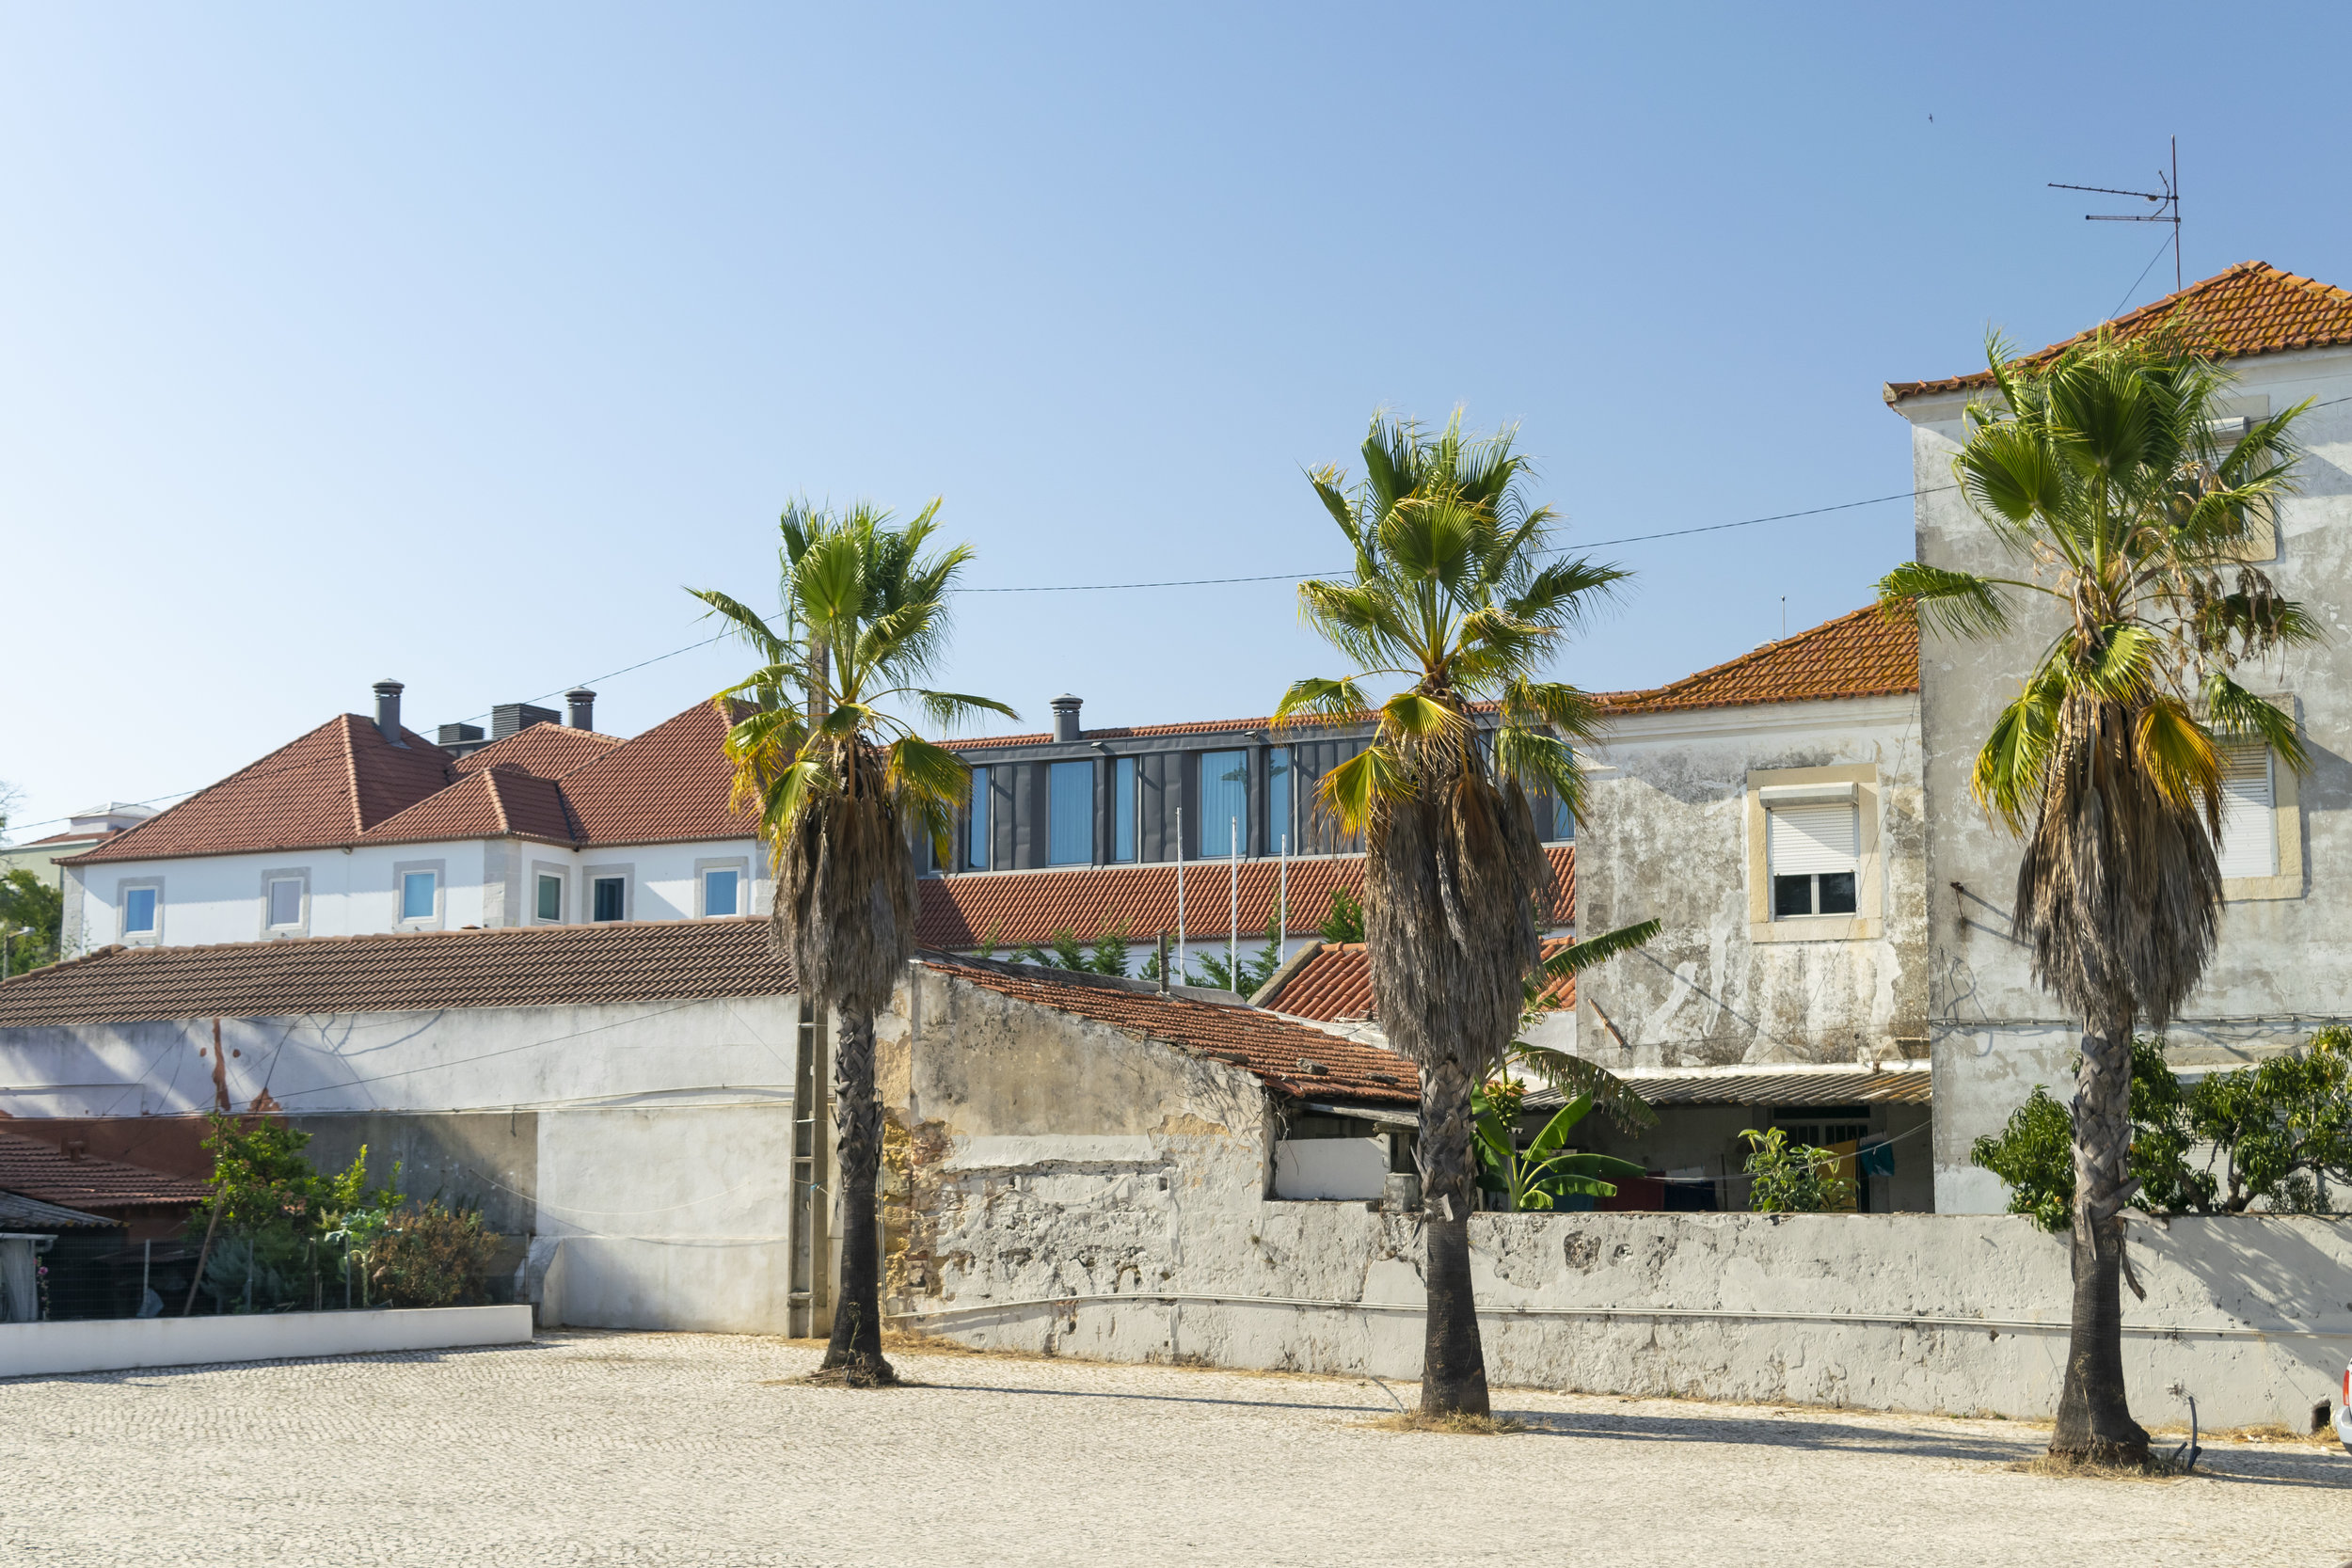 Portugal08.jpg